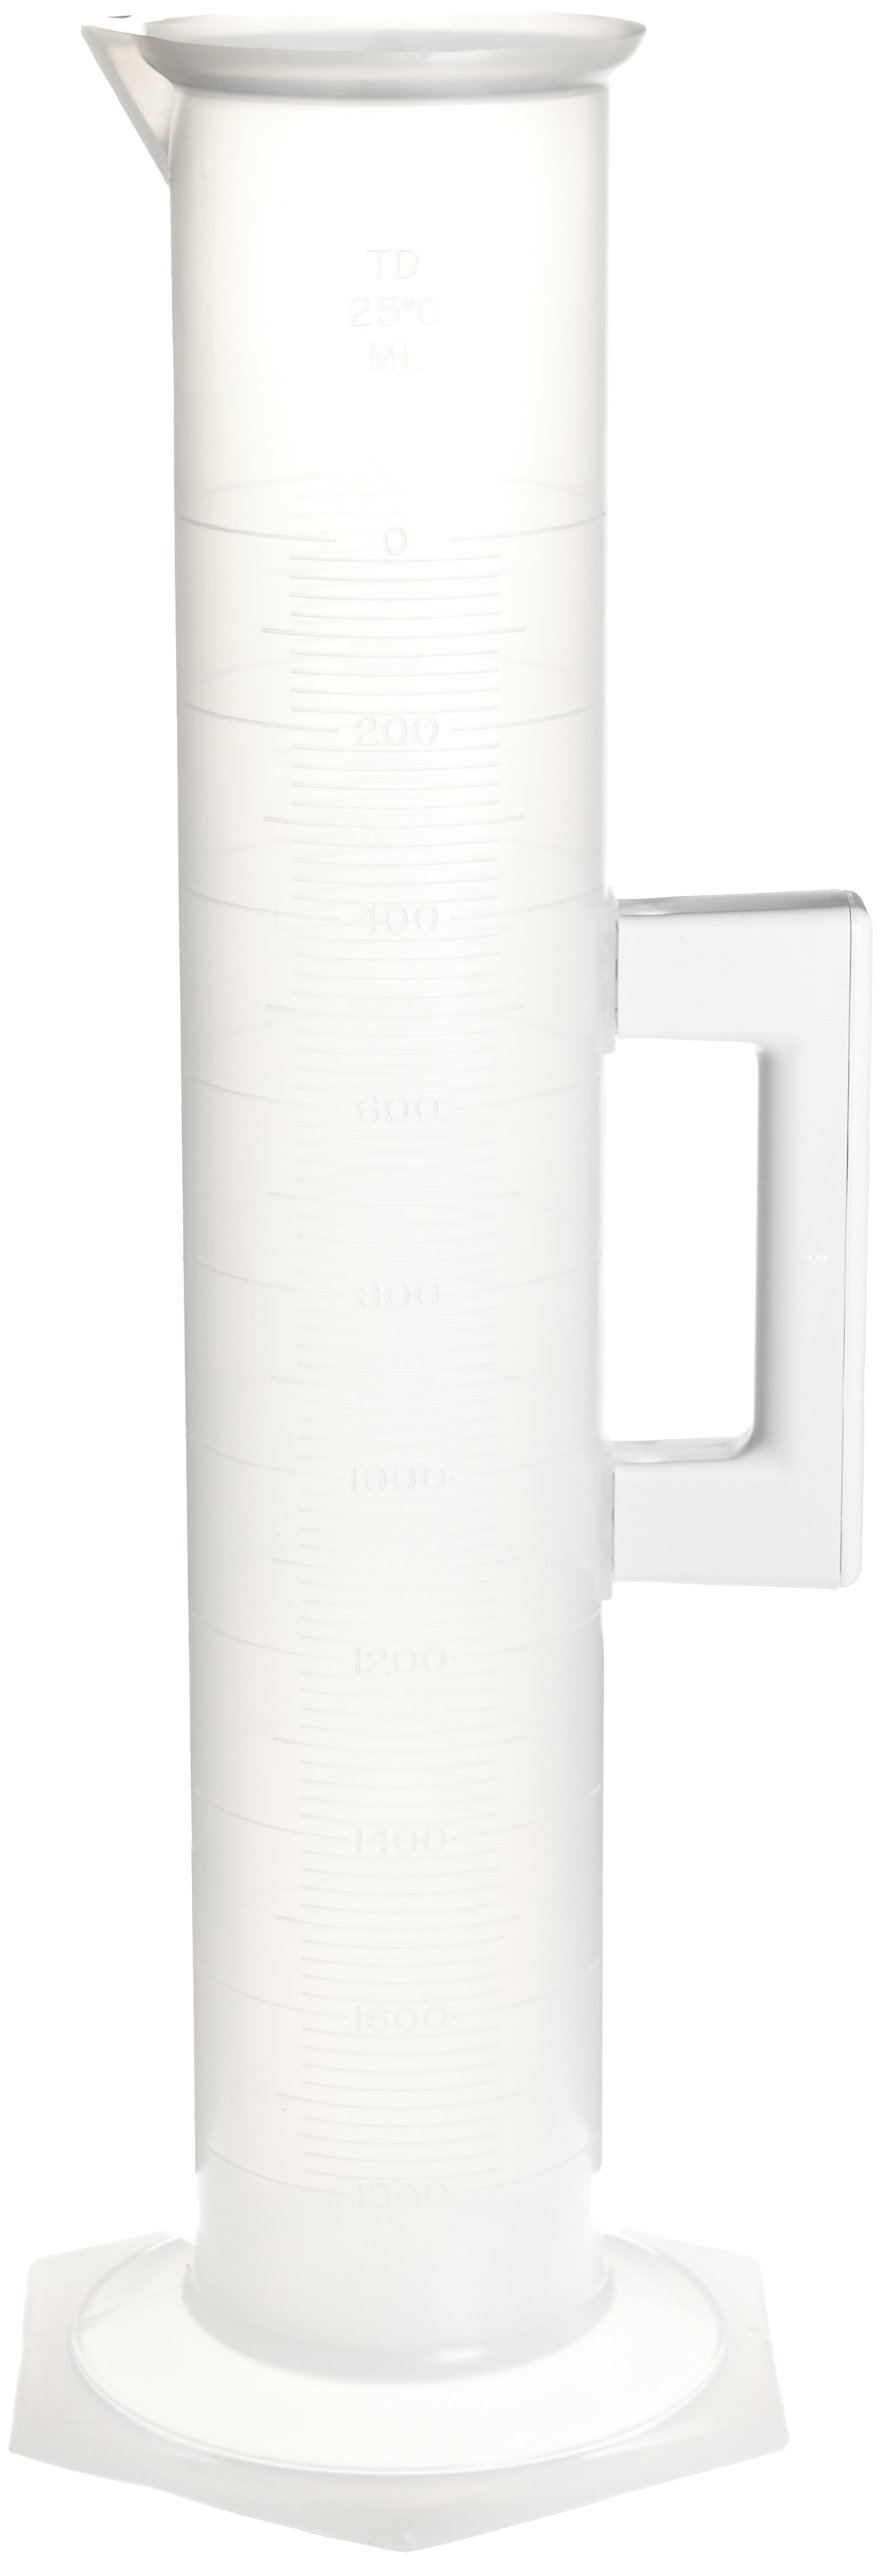 Bel-Art Holdfast 2000ml Polypropylene Graduated Cylinder; 20ml Graduation (F28461-2000)